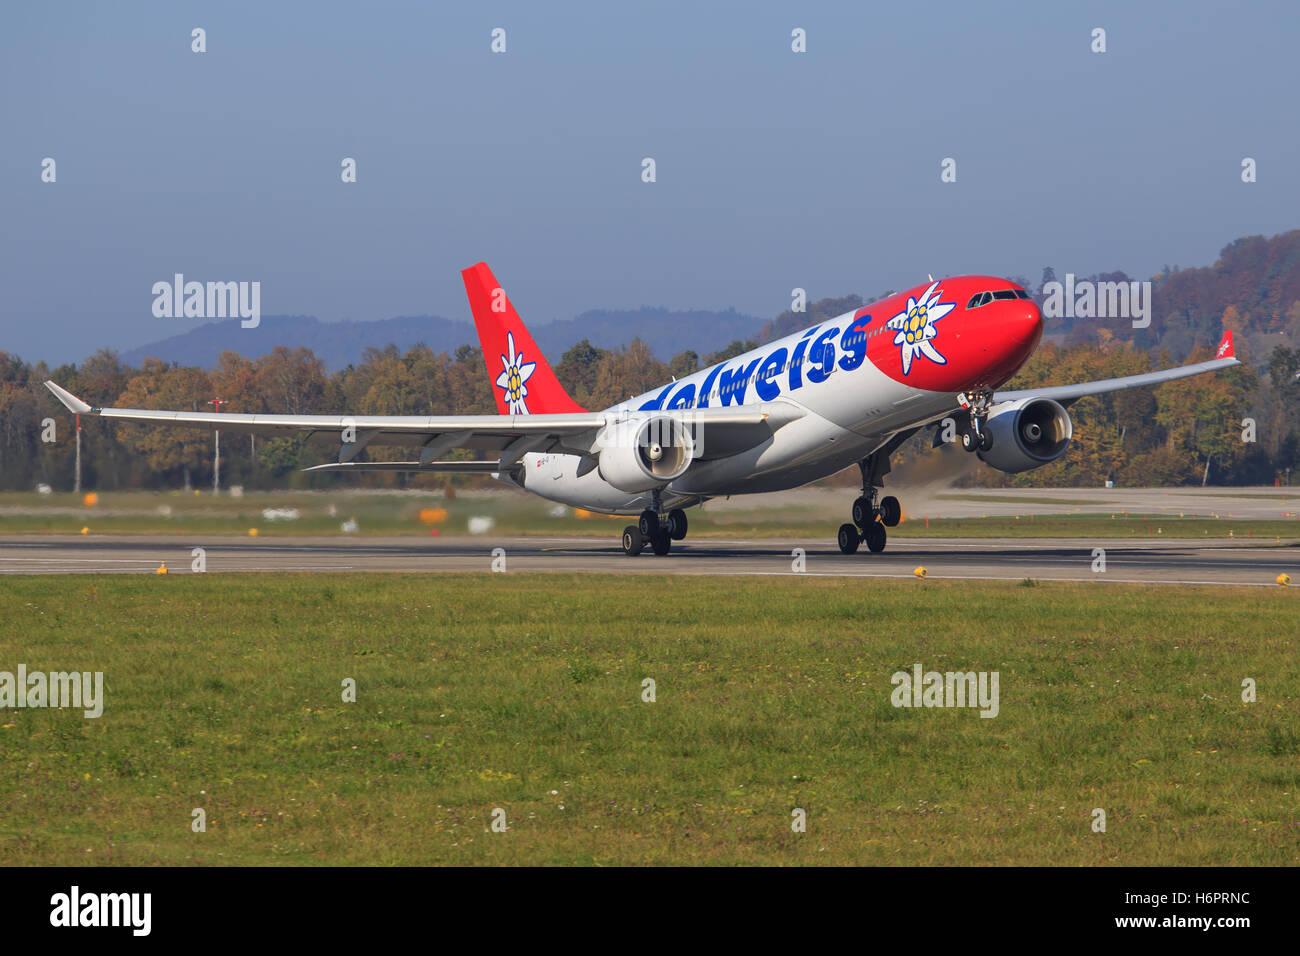 ZURICH - July 30: Edelweiss A330 take off at Terminal A of Zurich Airport on July 30, 2016 in Zurich, Switzerland - Stock Image